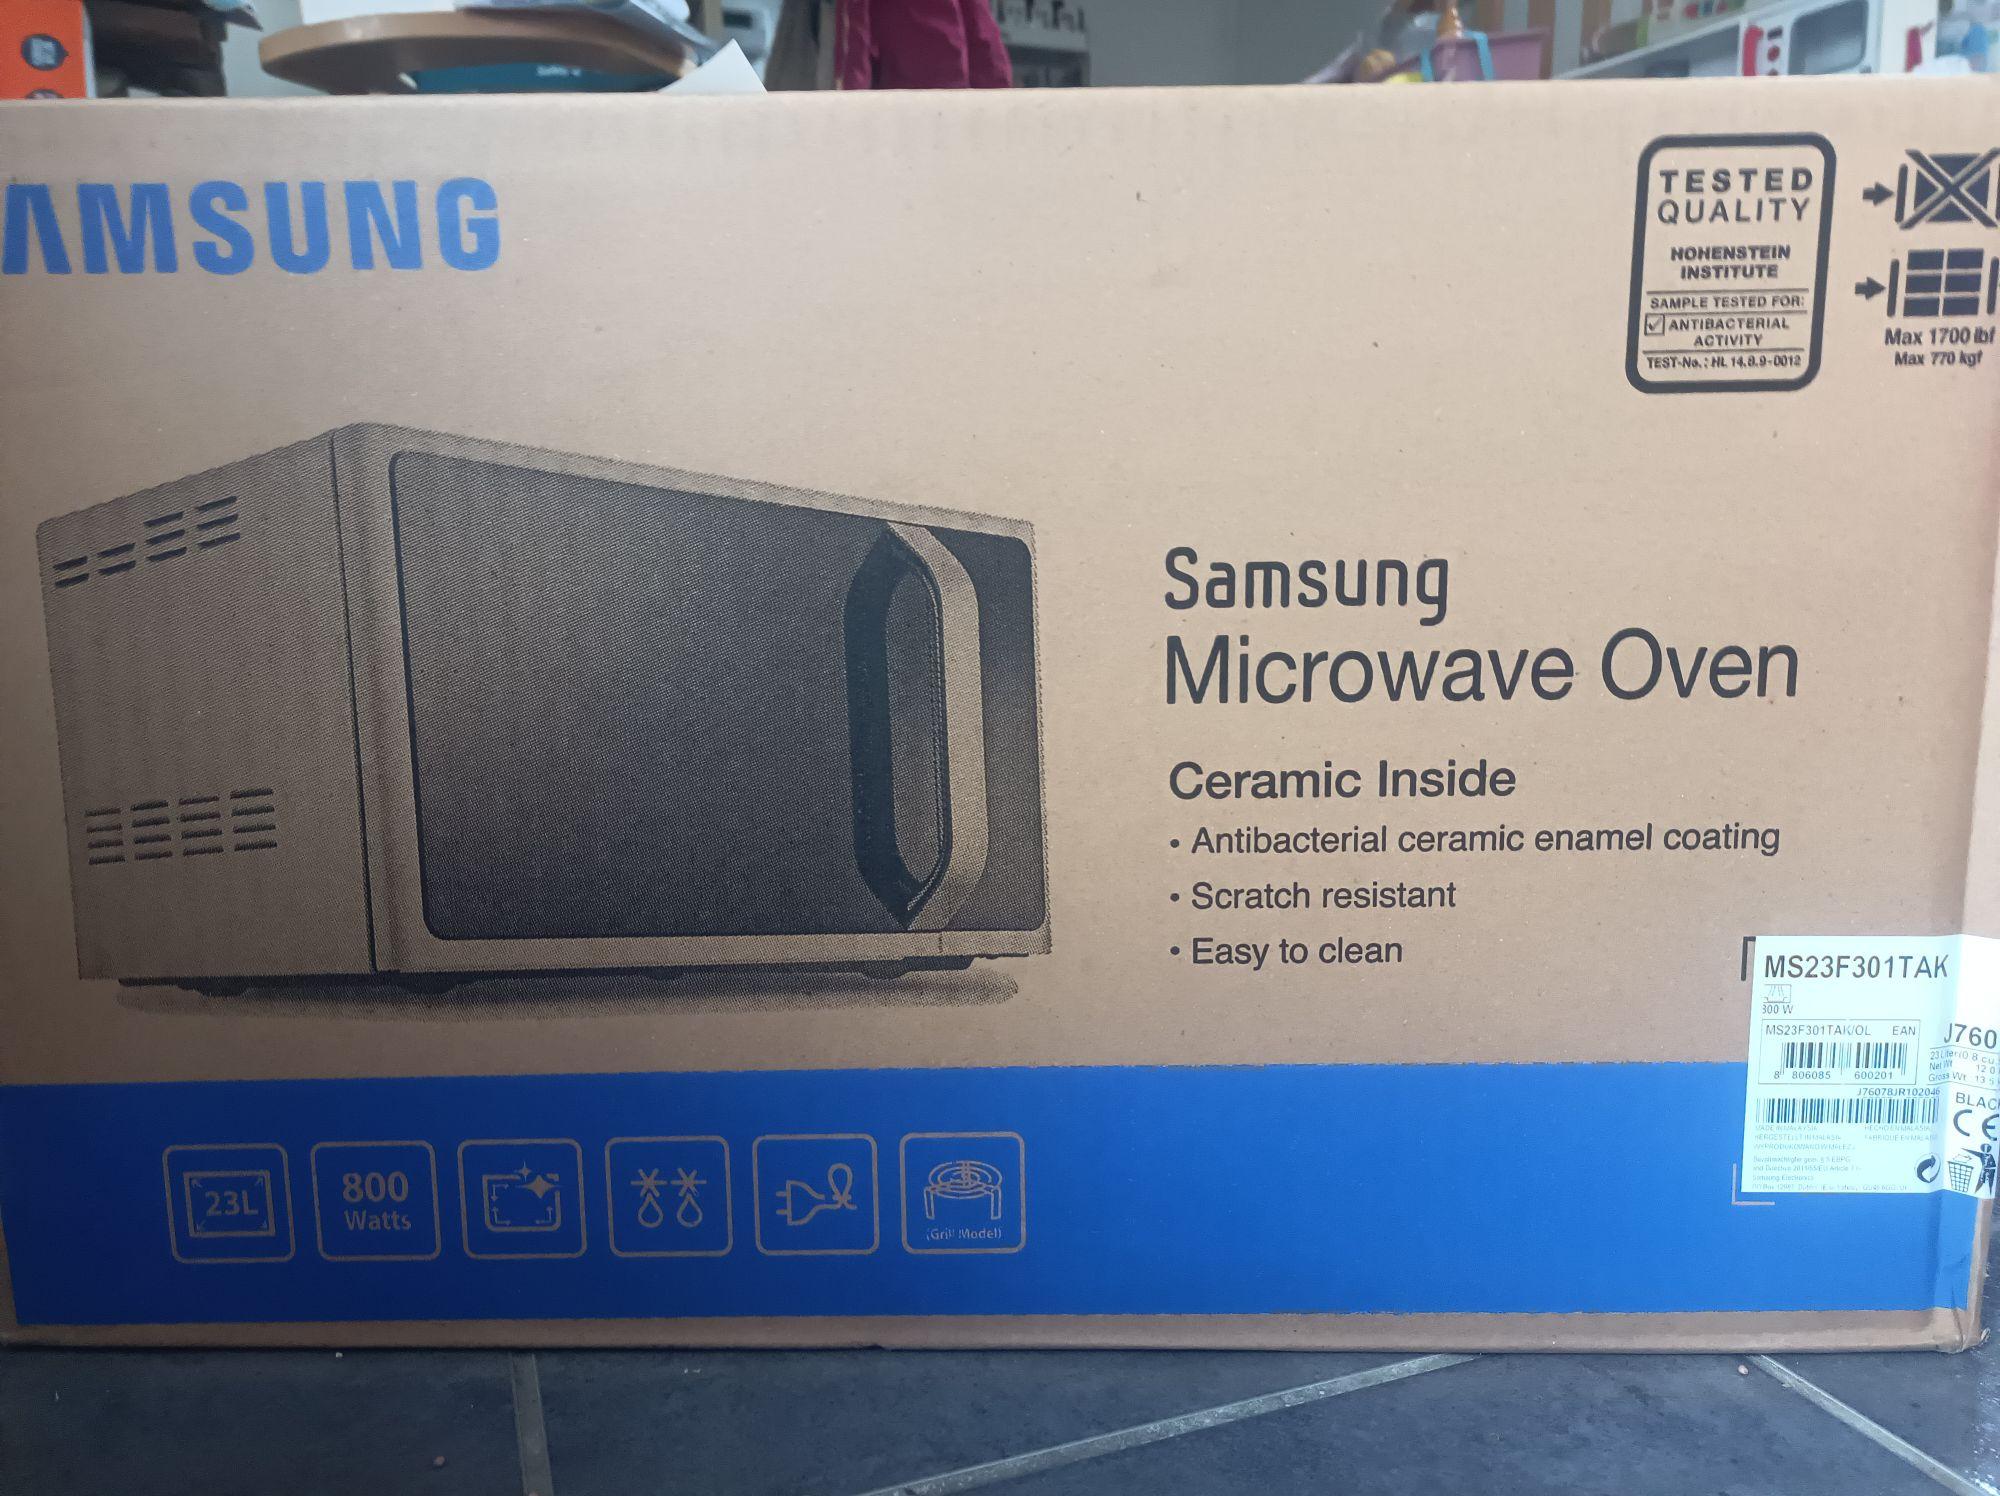 Micro-ondes Samsung MS23F301TAK - 23L, 800W - Entrepote Saint-Ouen-l'Aumône (95)